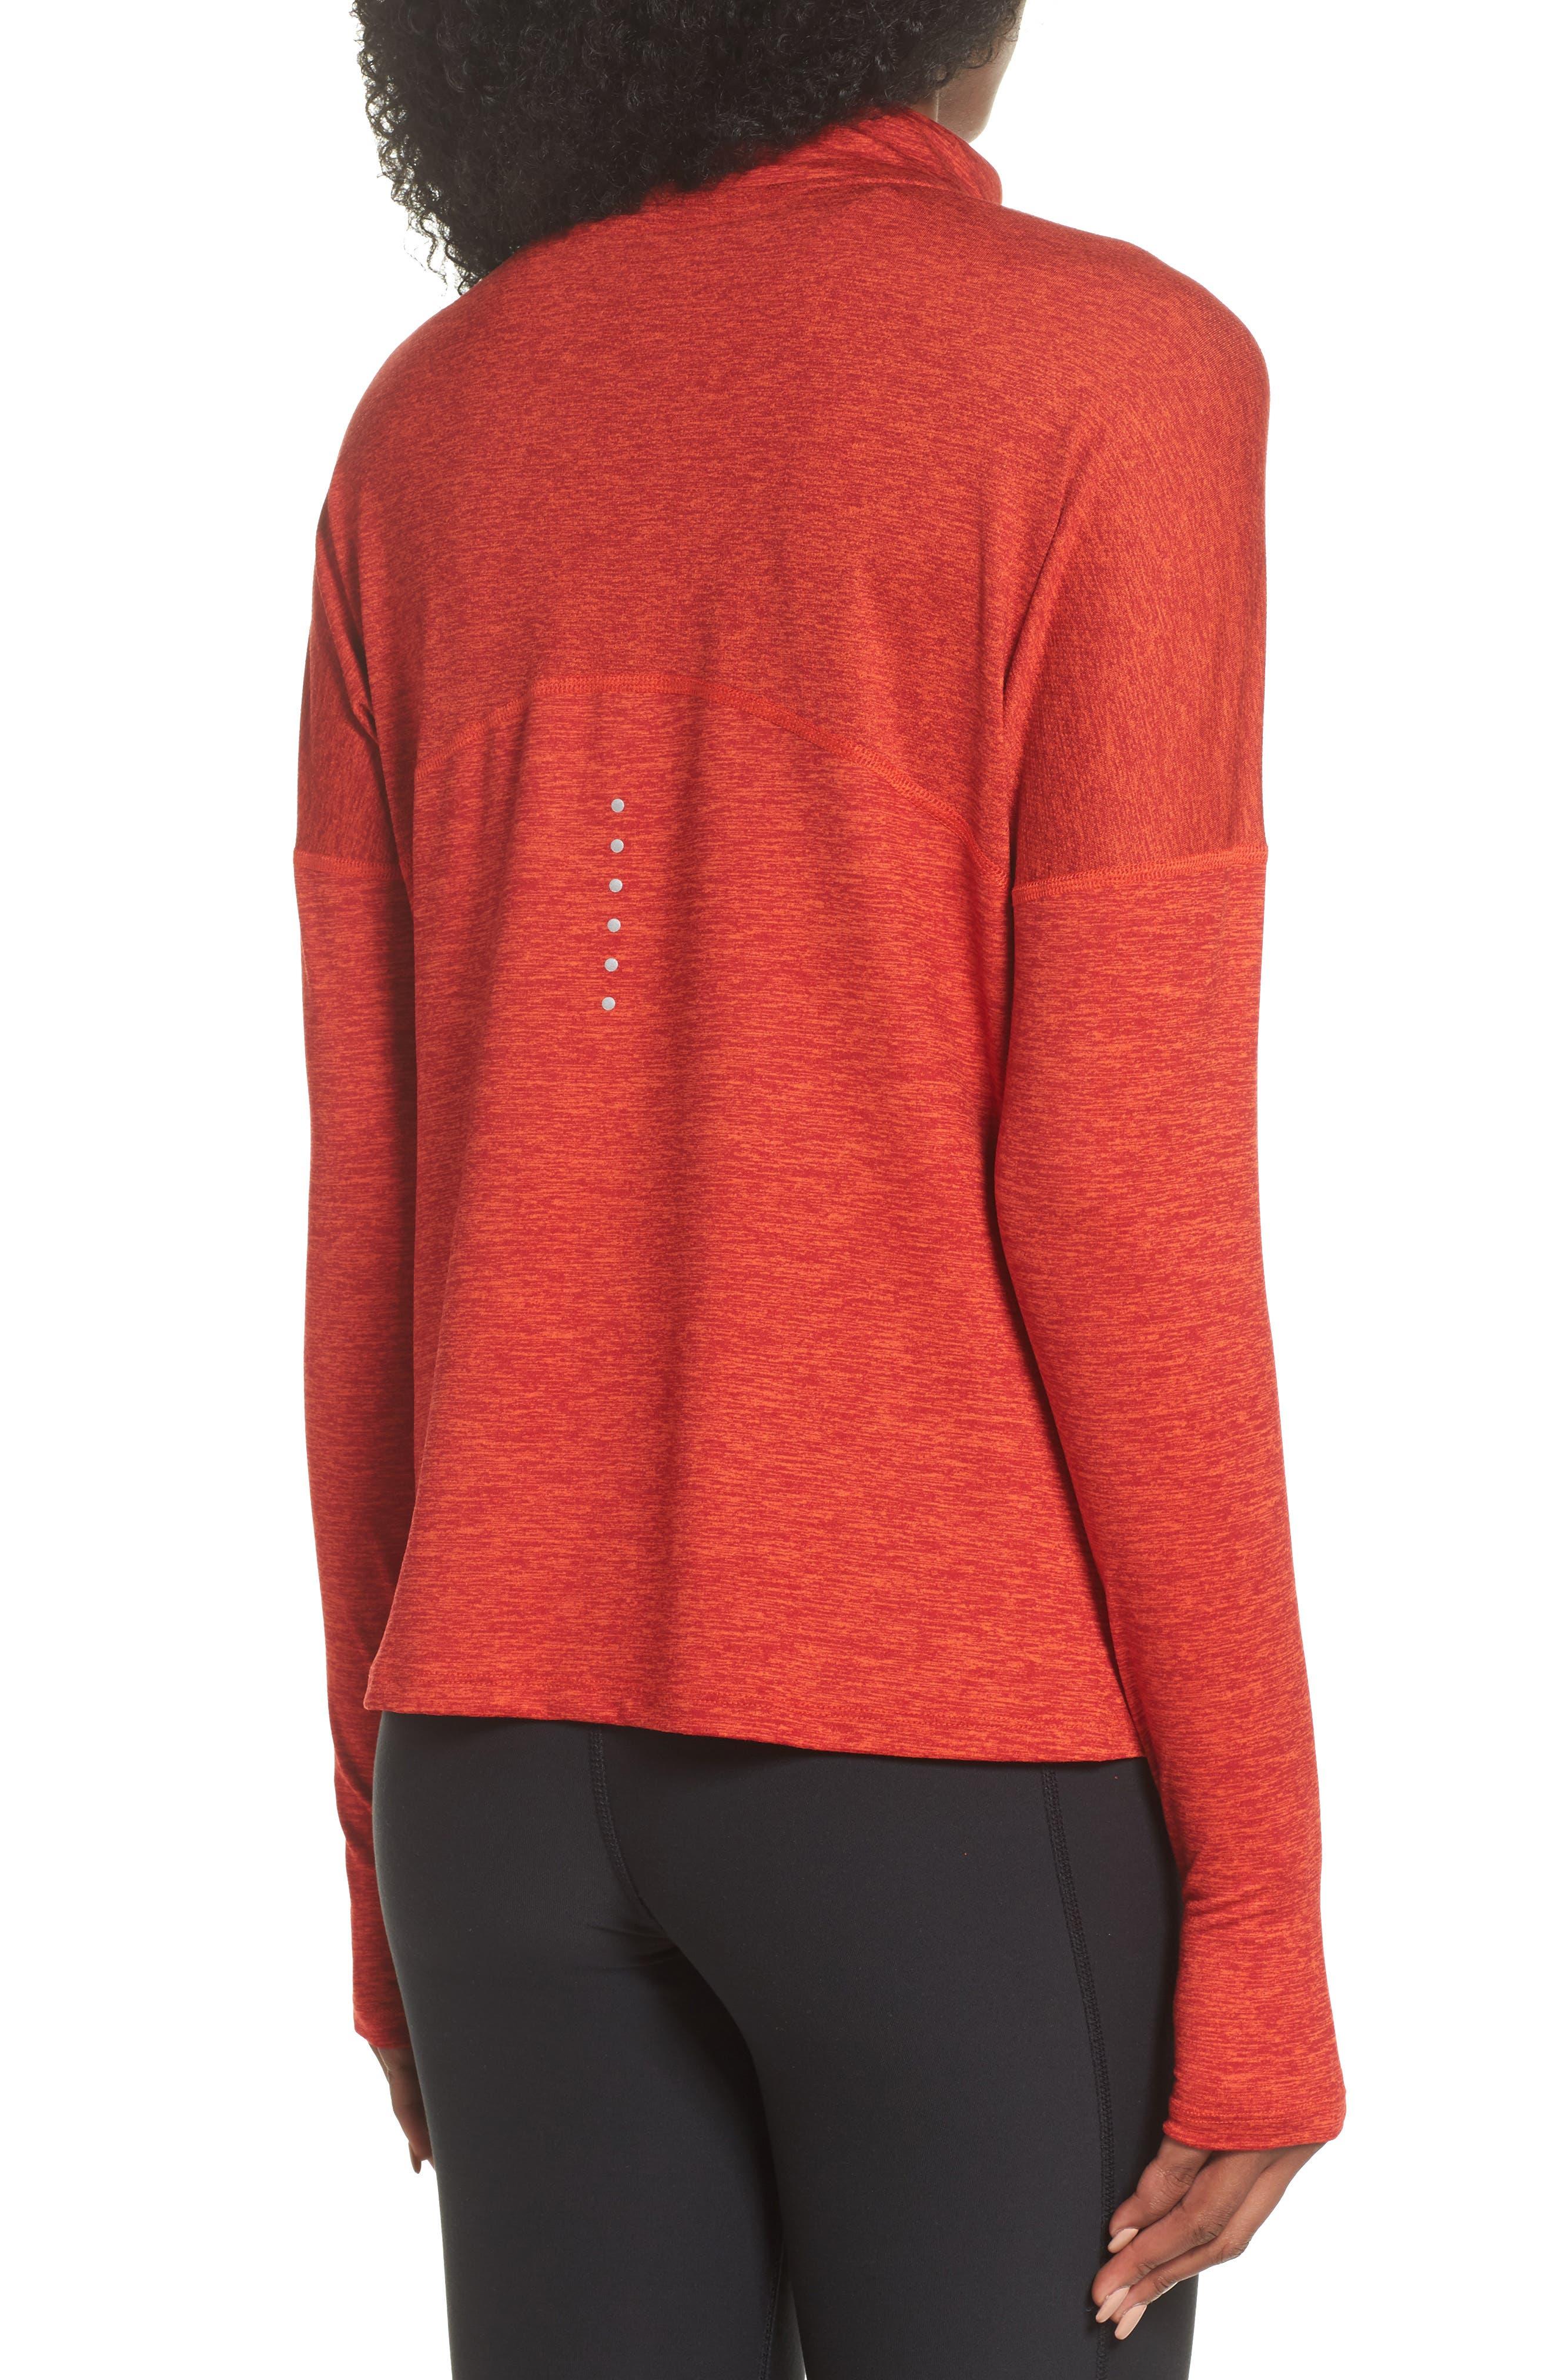 Alternate Image 2  - Nike Dry Element Half Zip Top